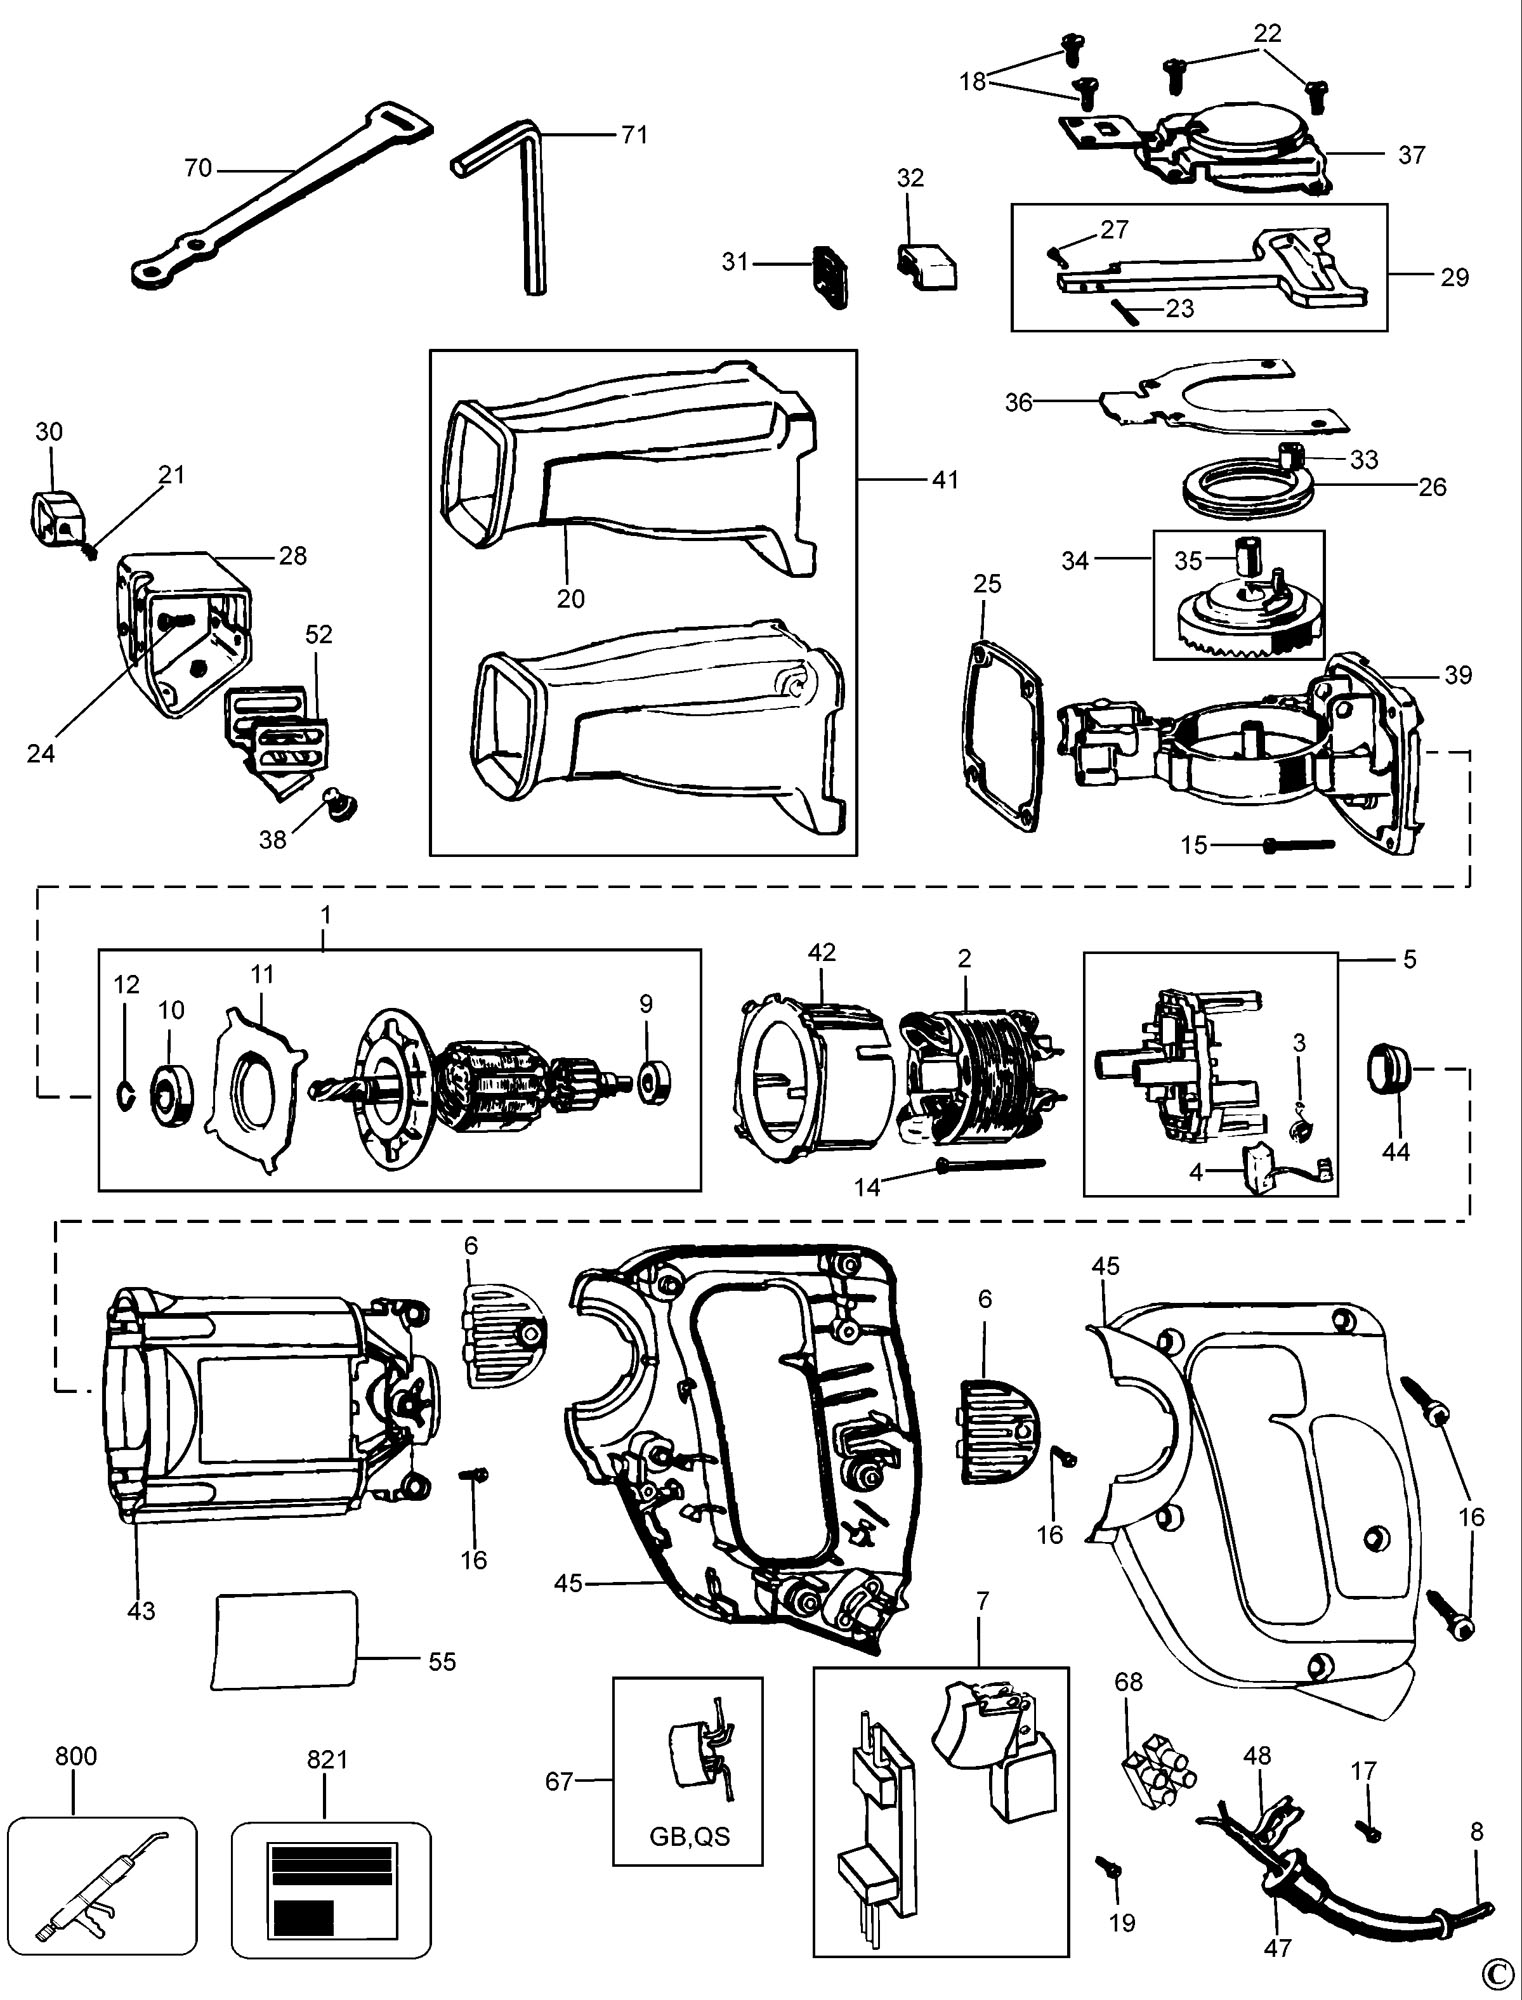 Spares For Dewalt Dw303k Cutsaw Type 1 Spare Dw303k Type